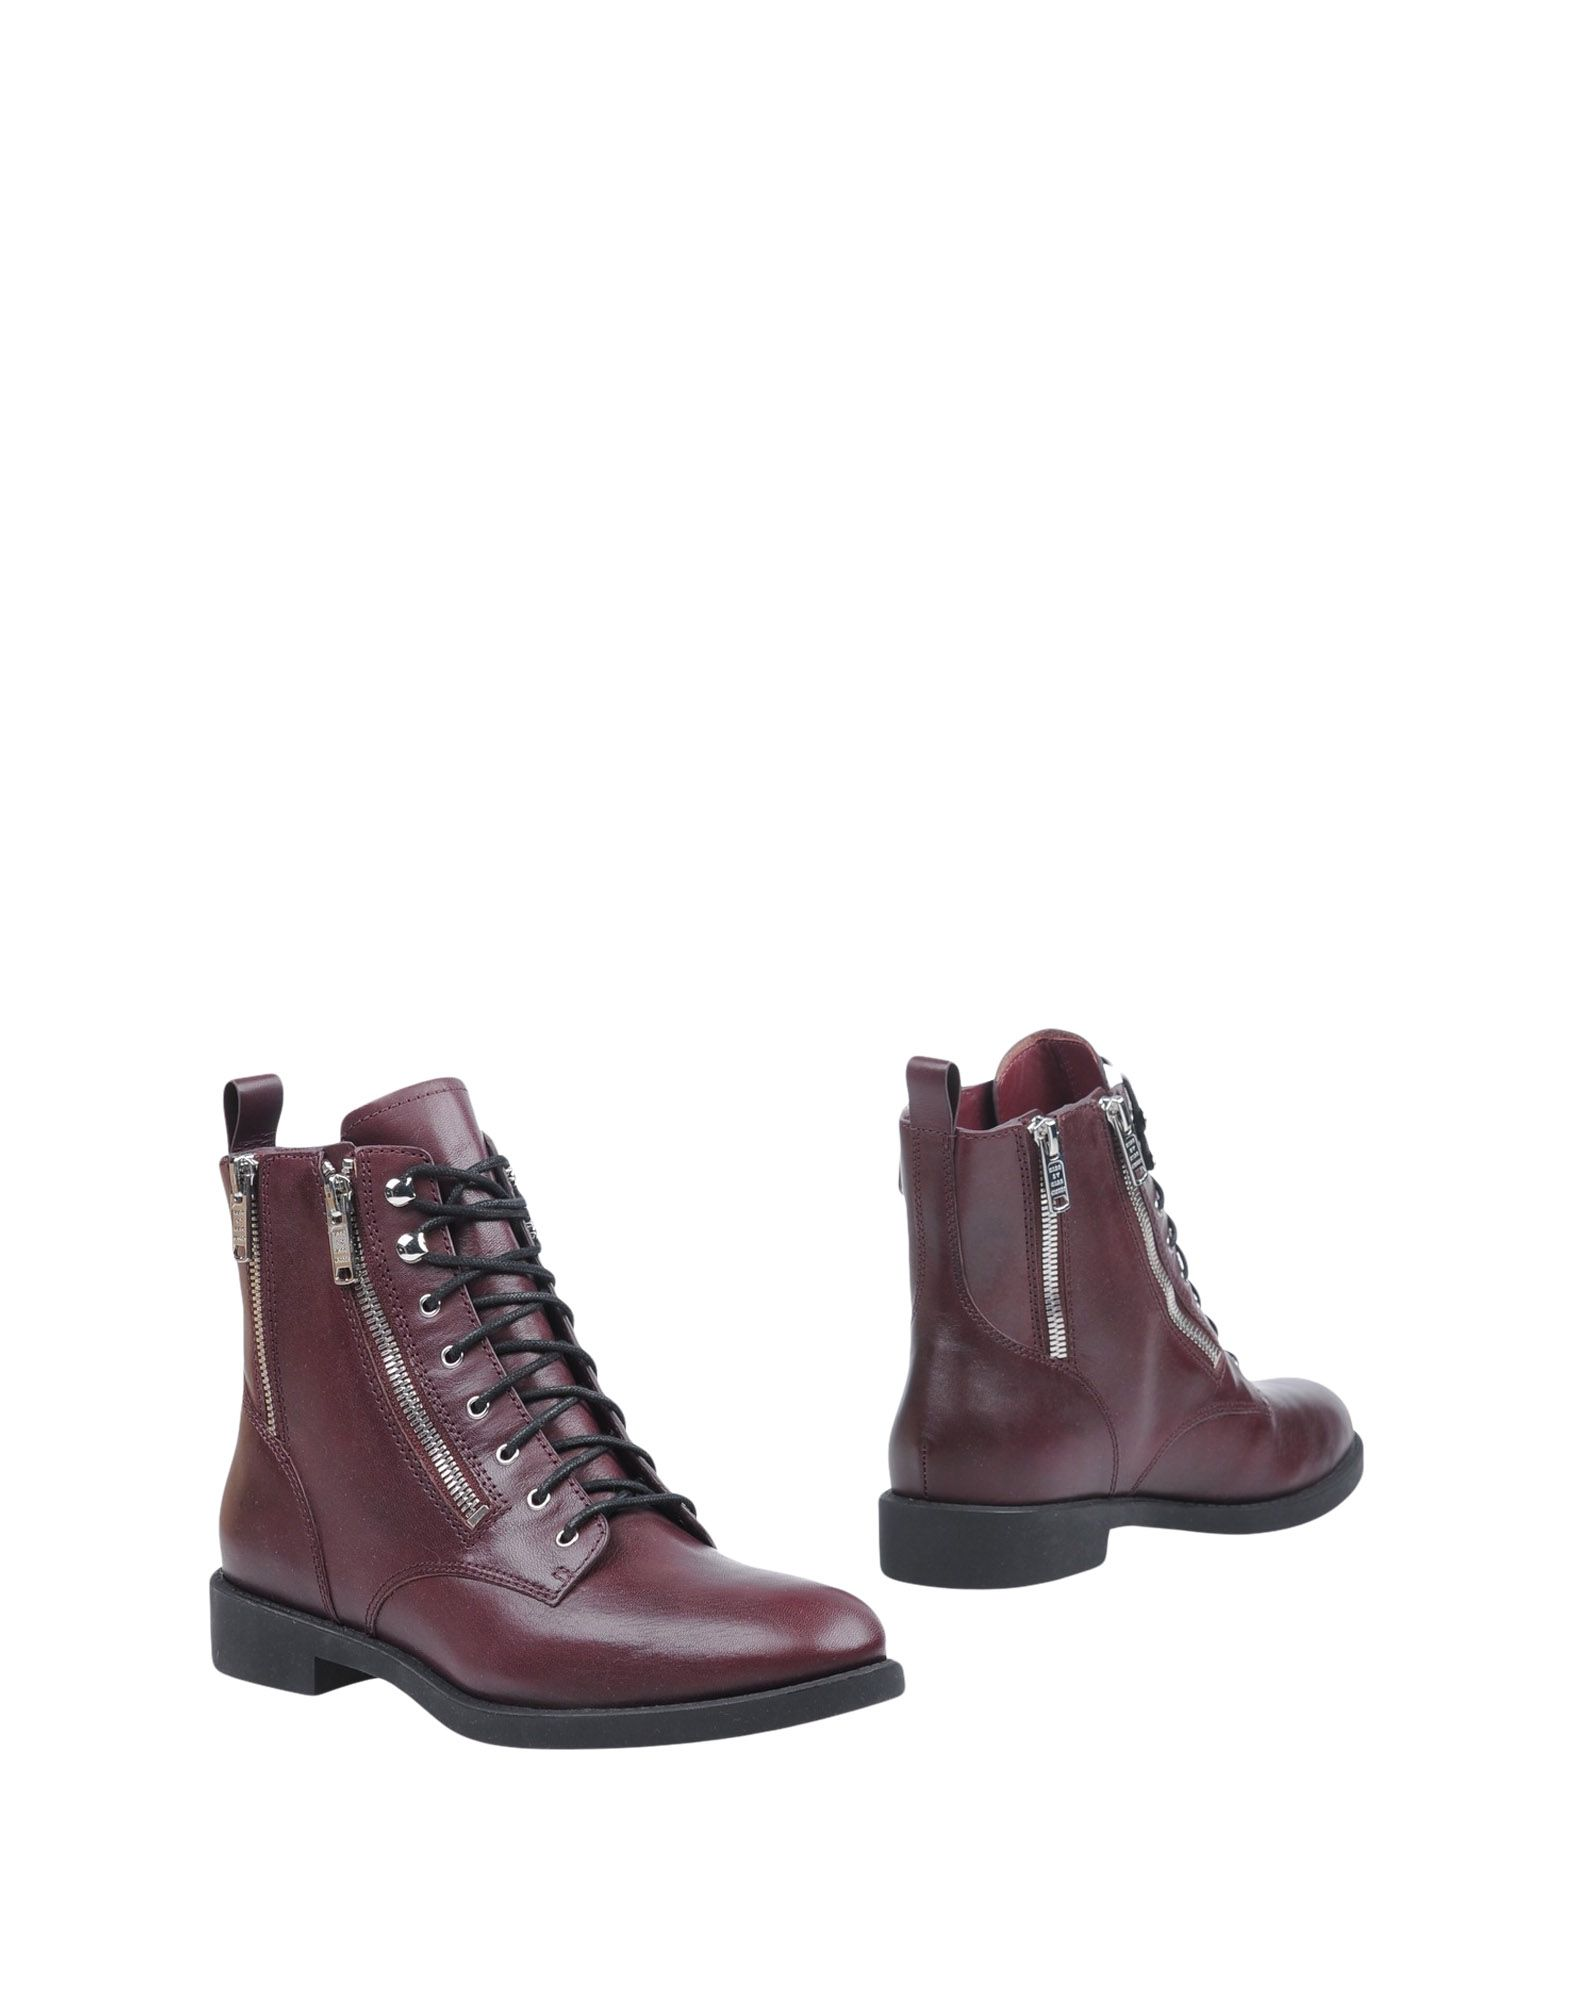 Marc By Marc Jacobs Stiefelette Damen  11224859TSGut aussehende strapazierfähige Schuhe